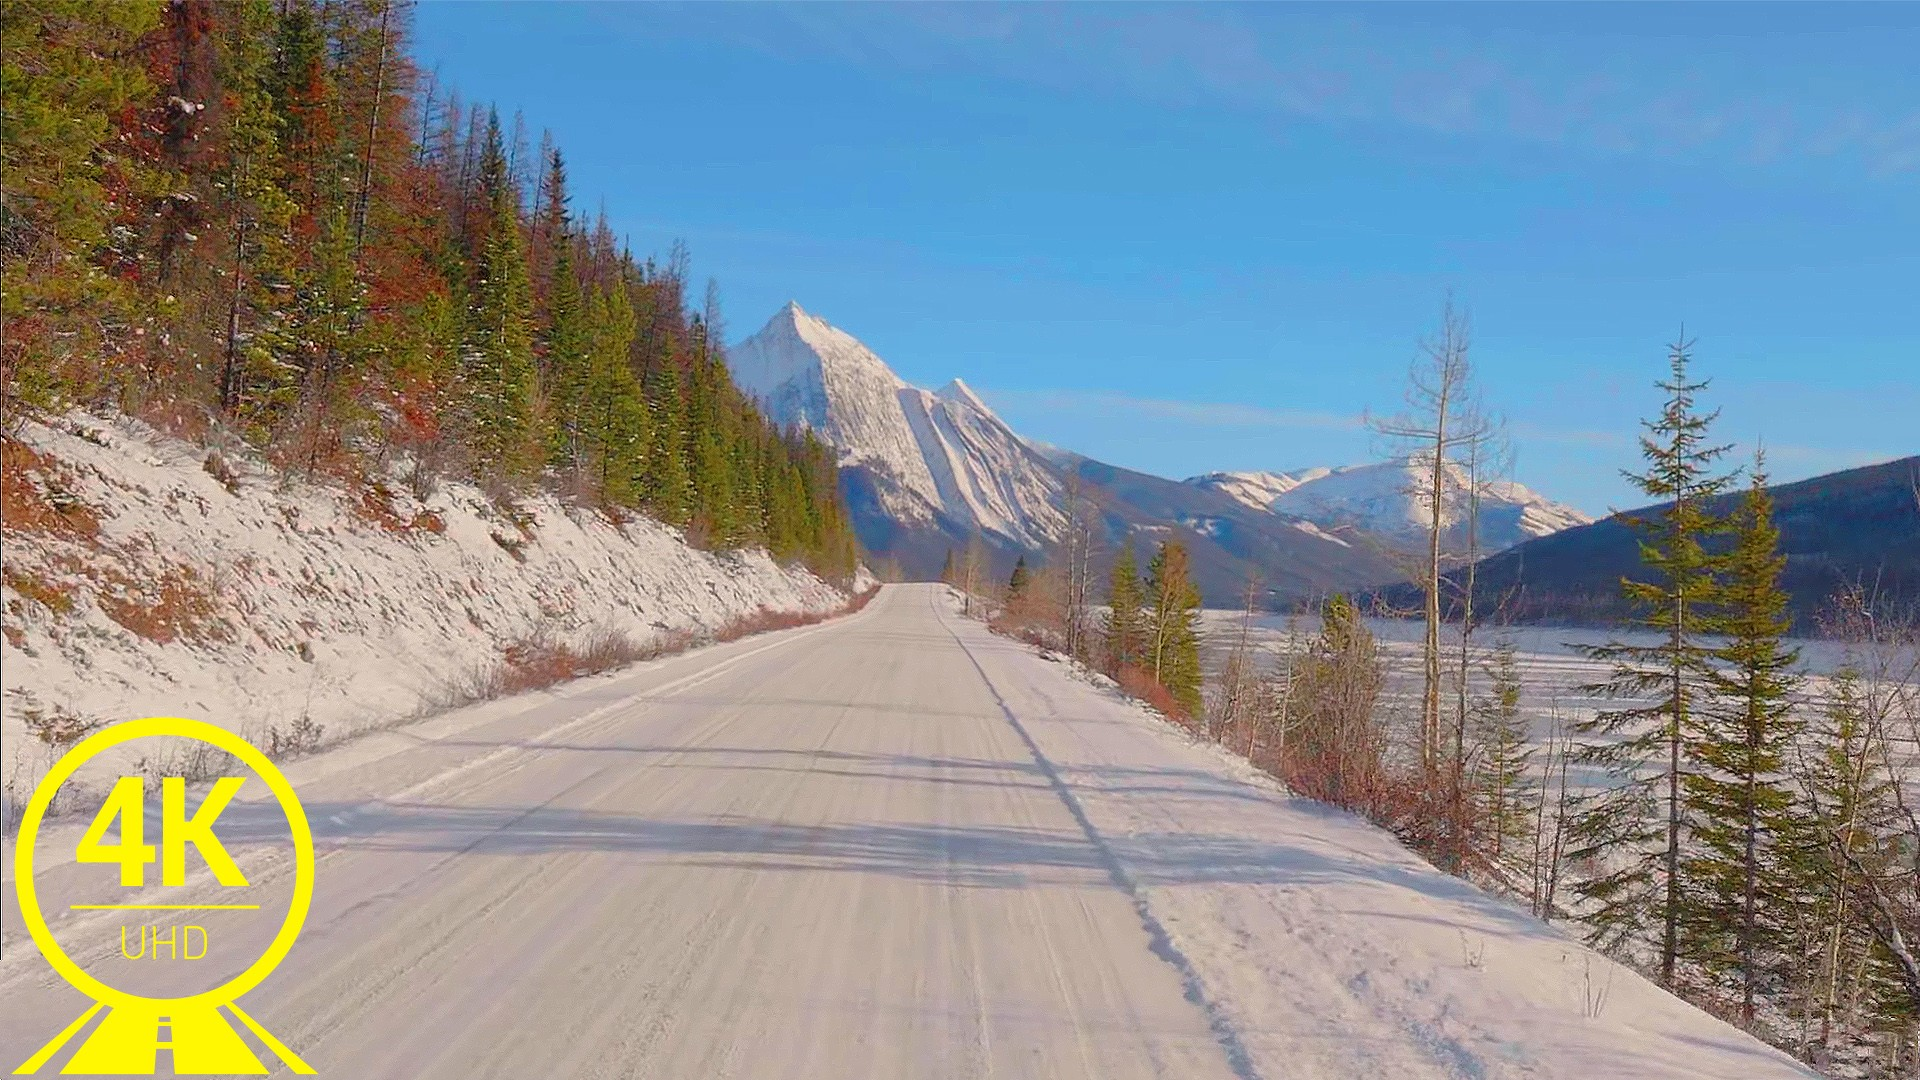 Jasper National Park Scenic Drive Part 2